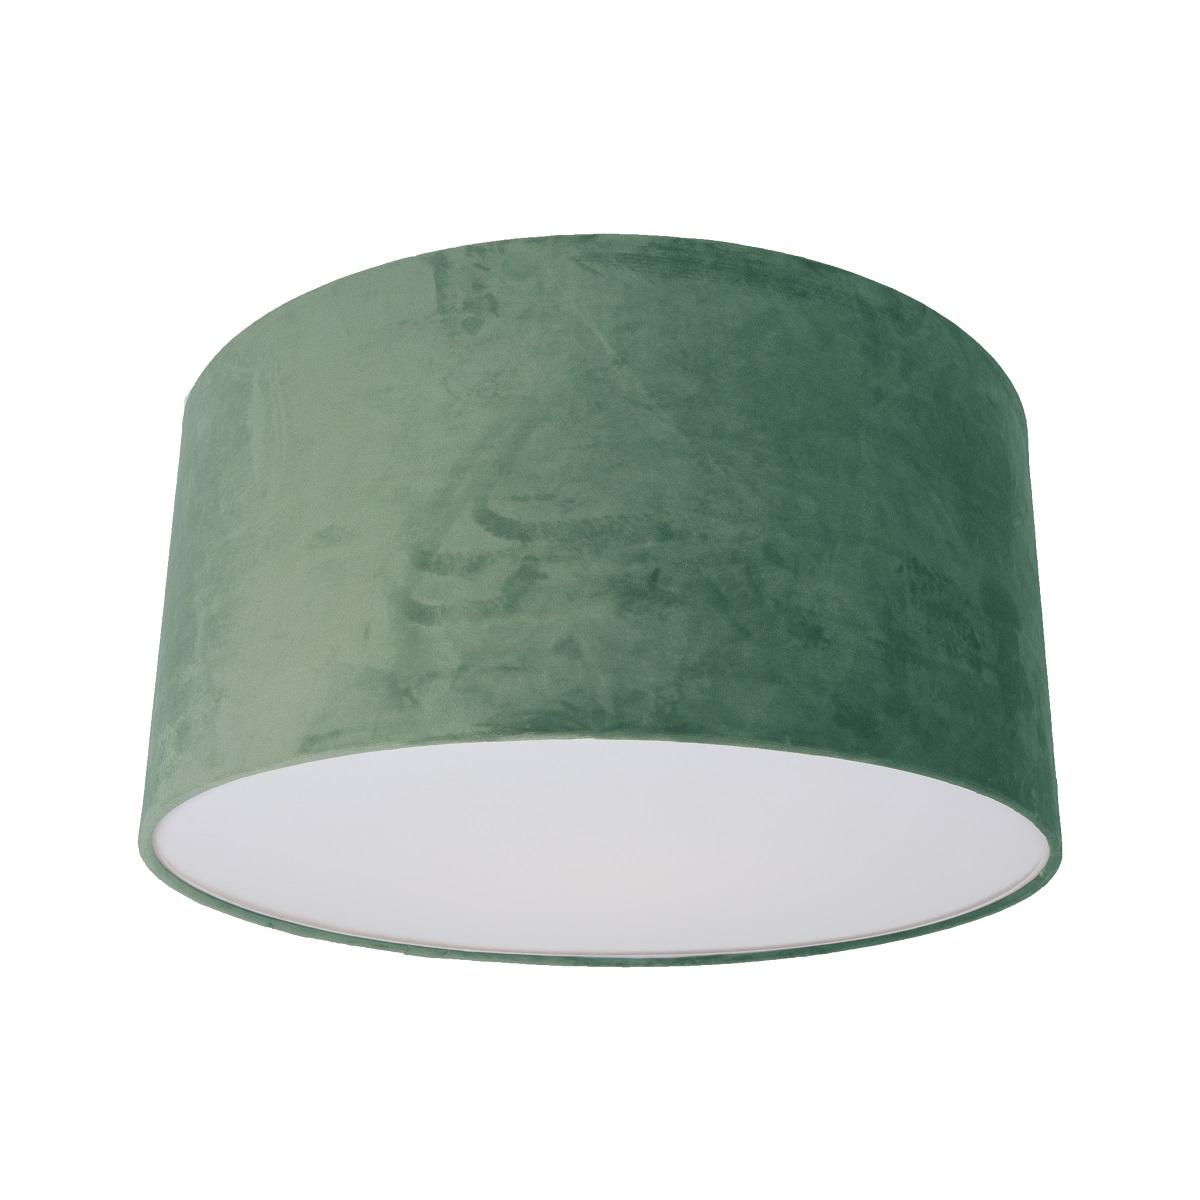 lampenhelden vandeheg deckenleuchte canop id velvet green samt gr n 50x34cm max 60watt. Black Bedroom Furniture Sets. Home Design Ideas